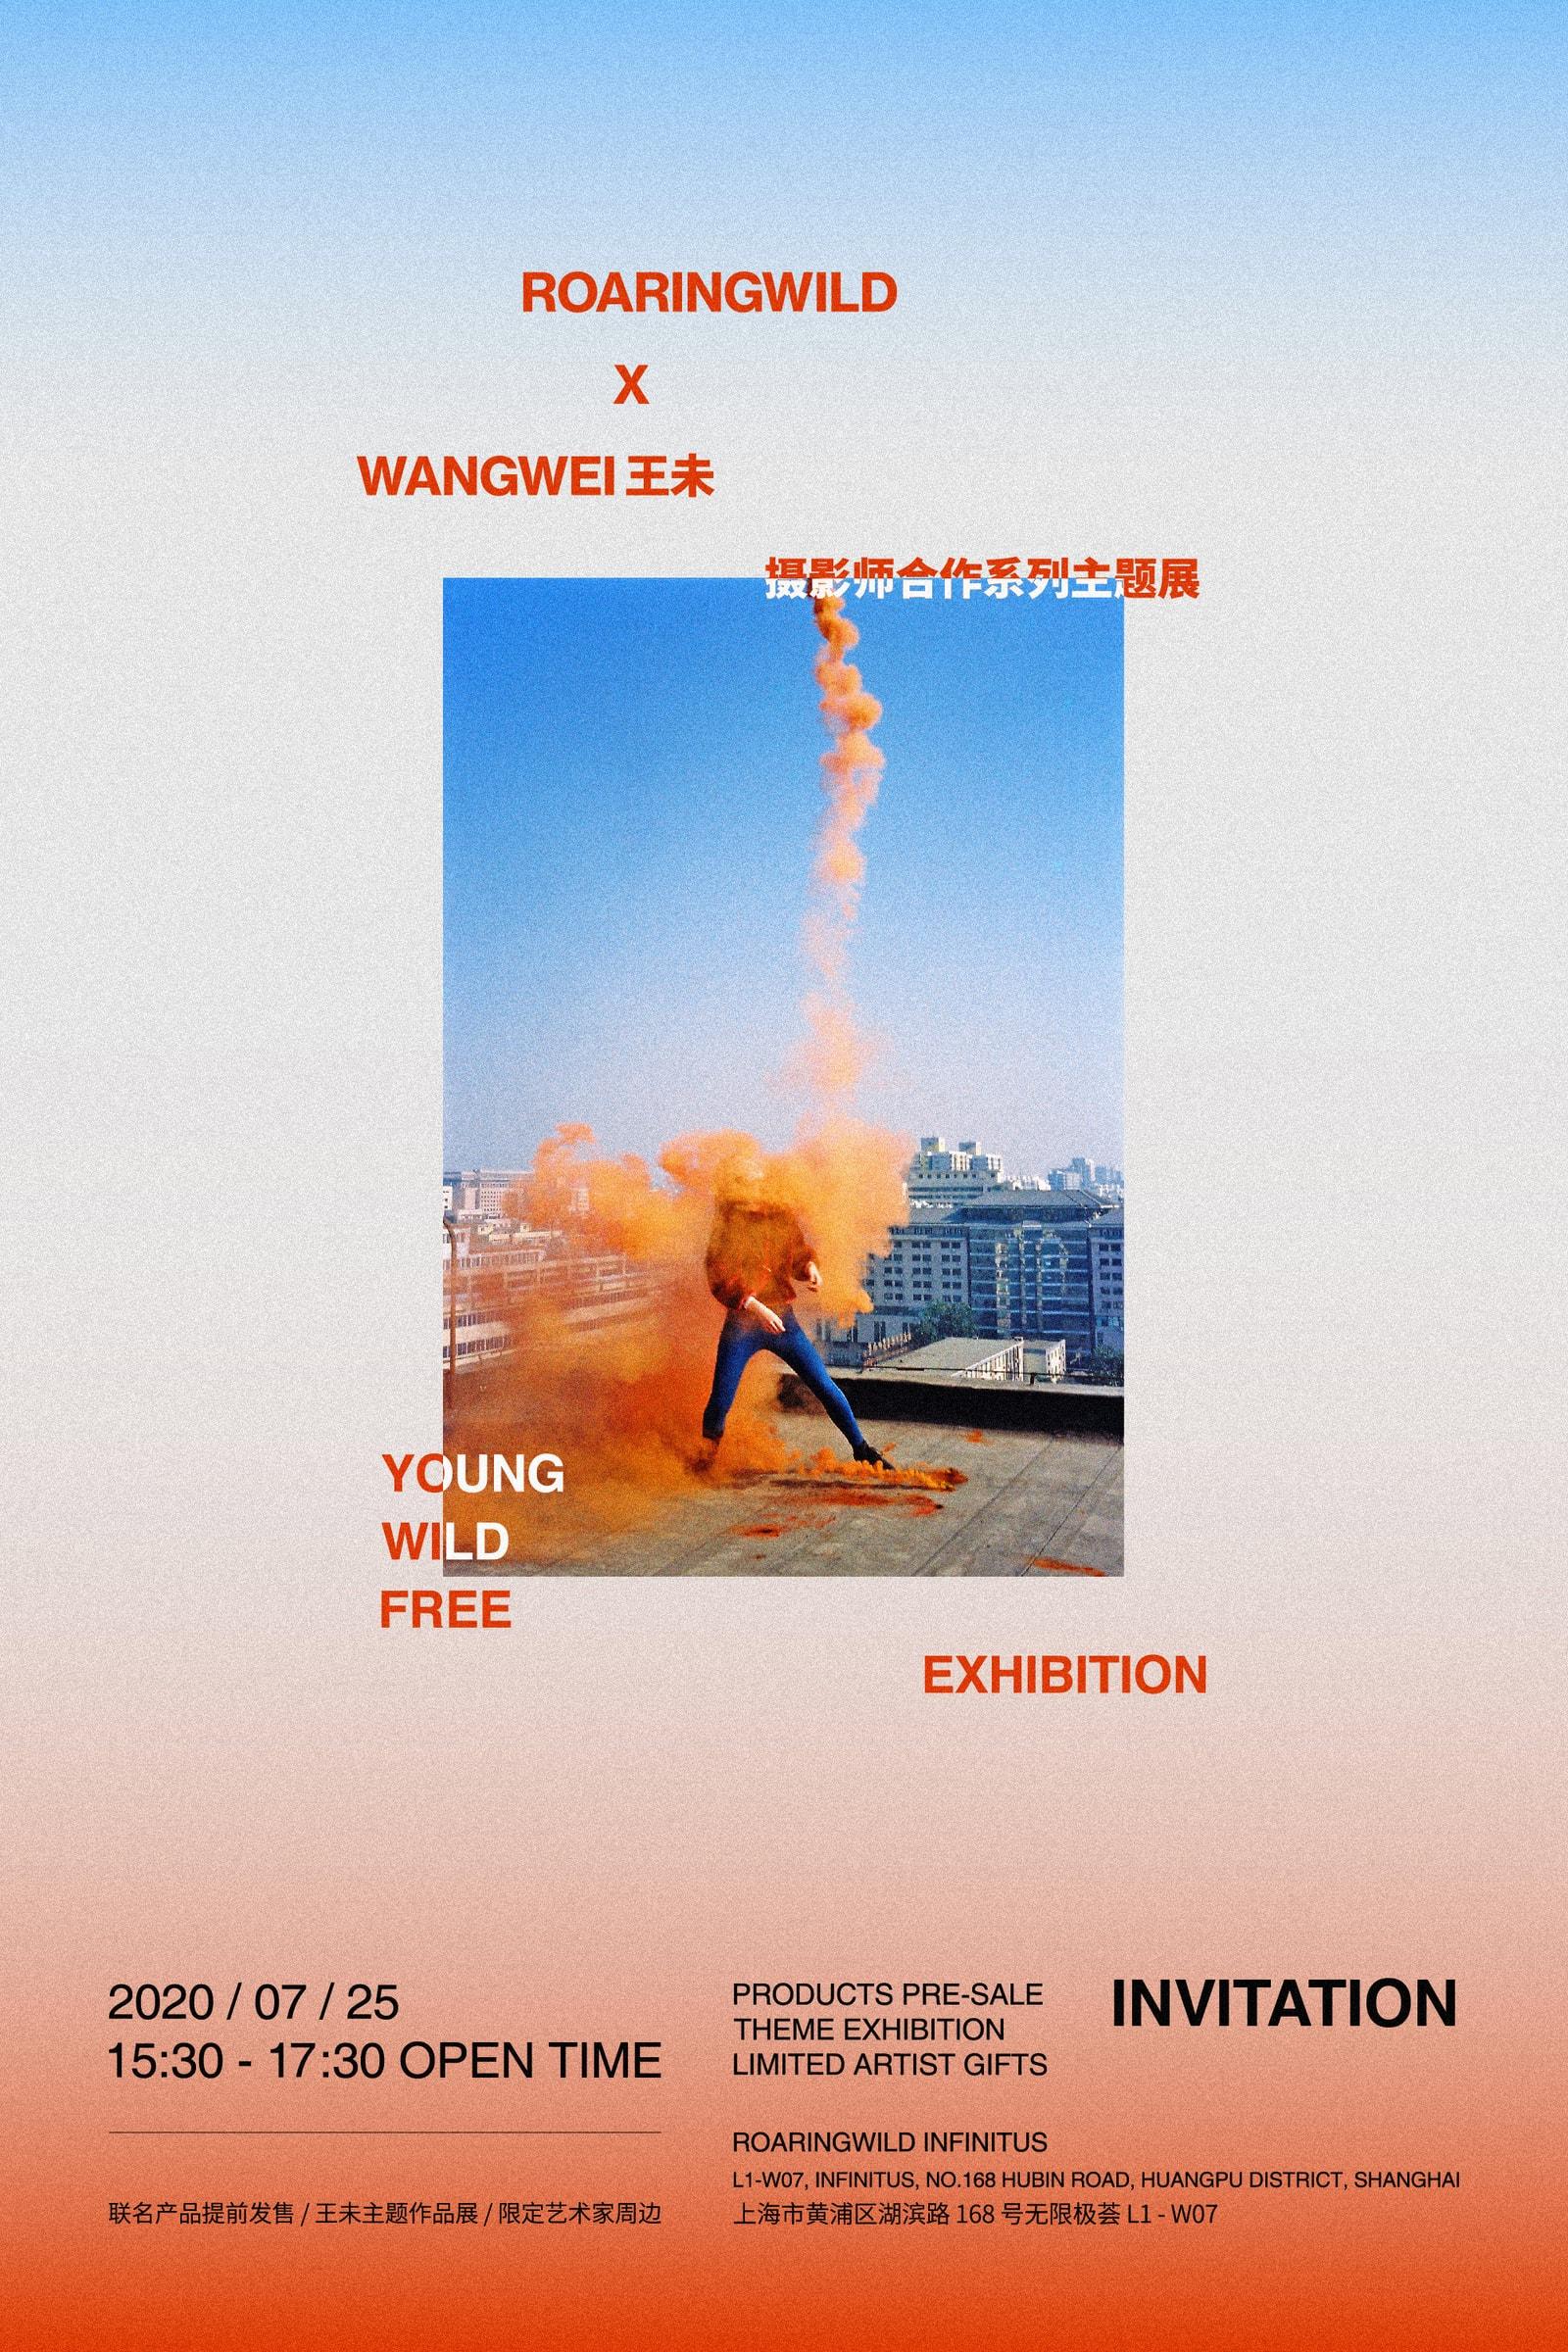 ROARINGWILD 攜手攝影師王未打造「Young Wild Free」跨界聯名系列